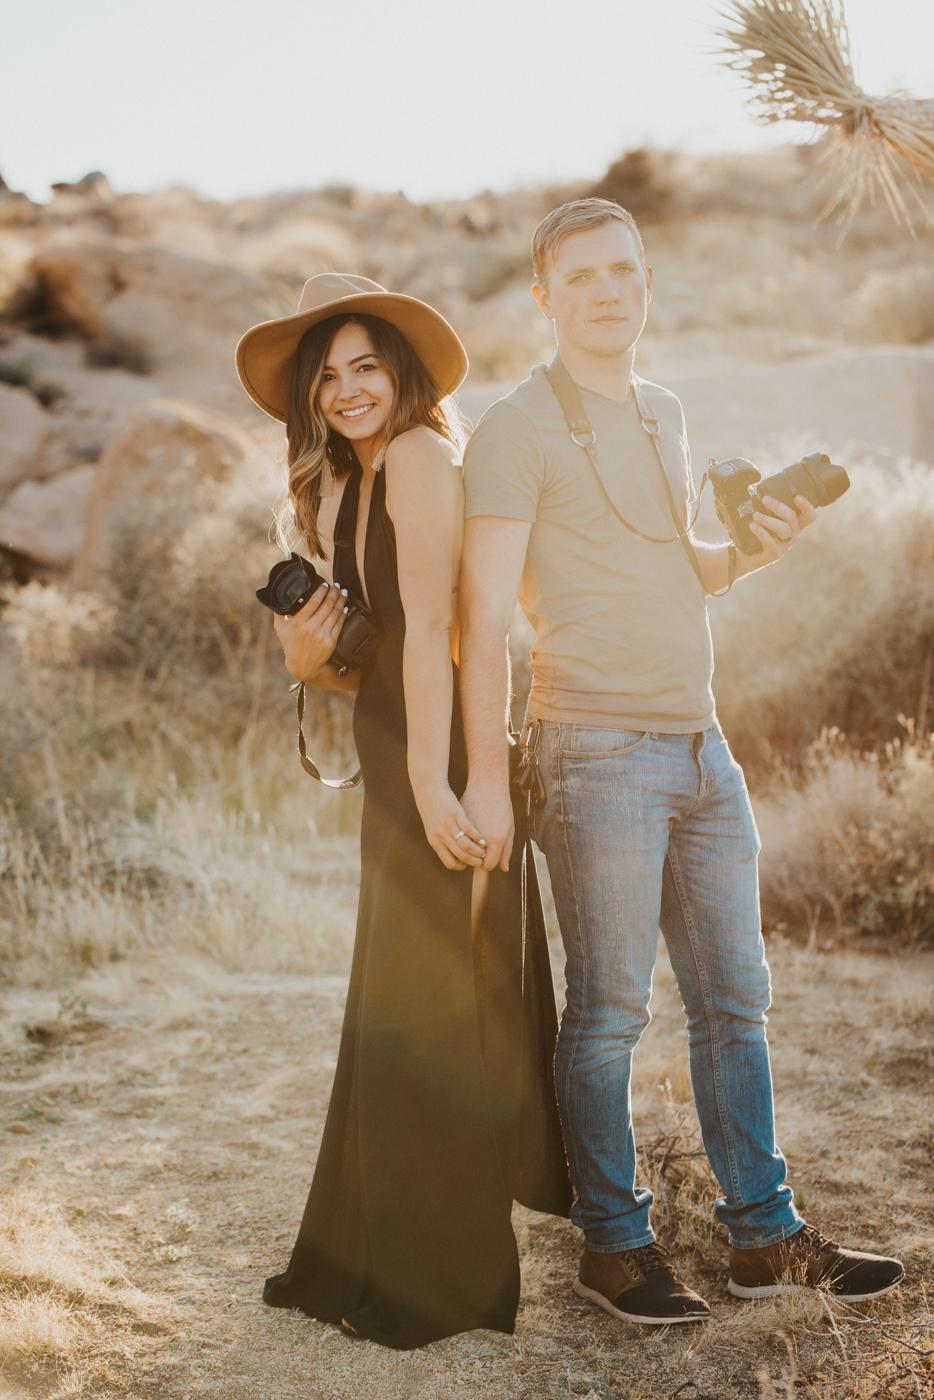 FortSt.John_photographer_TyraEPhotography_Wedding_Couple_Family_Photograhy_DawsonCreek_Elopement_Bride_Boduoir_Portraits-4275.jpg